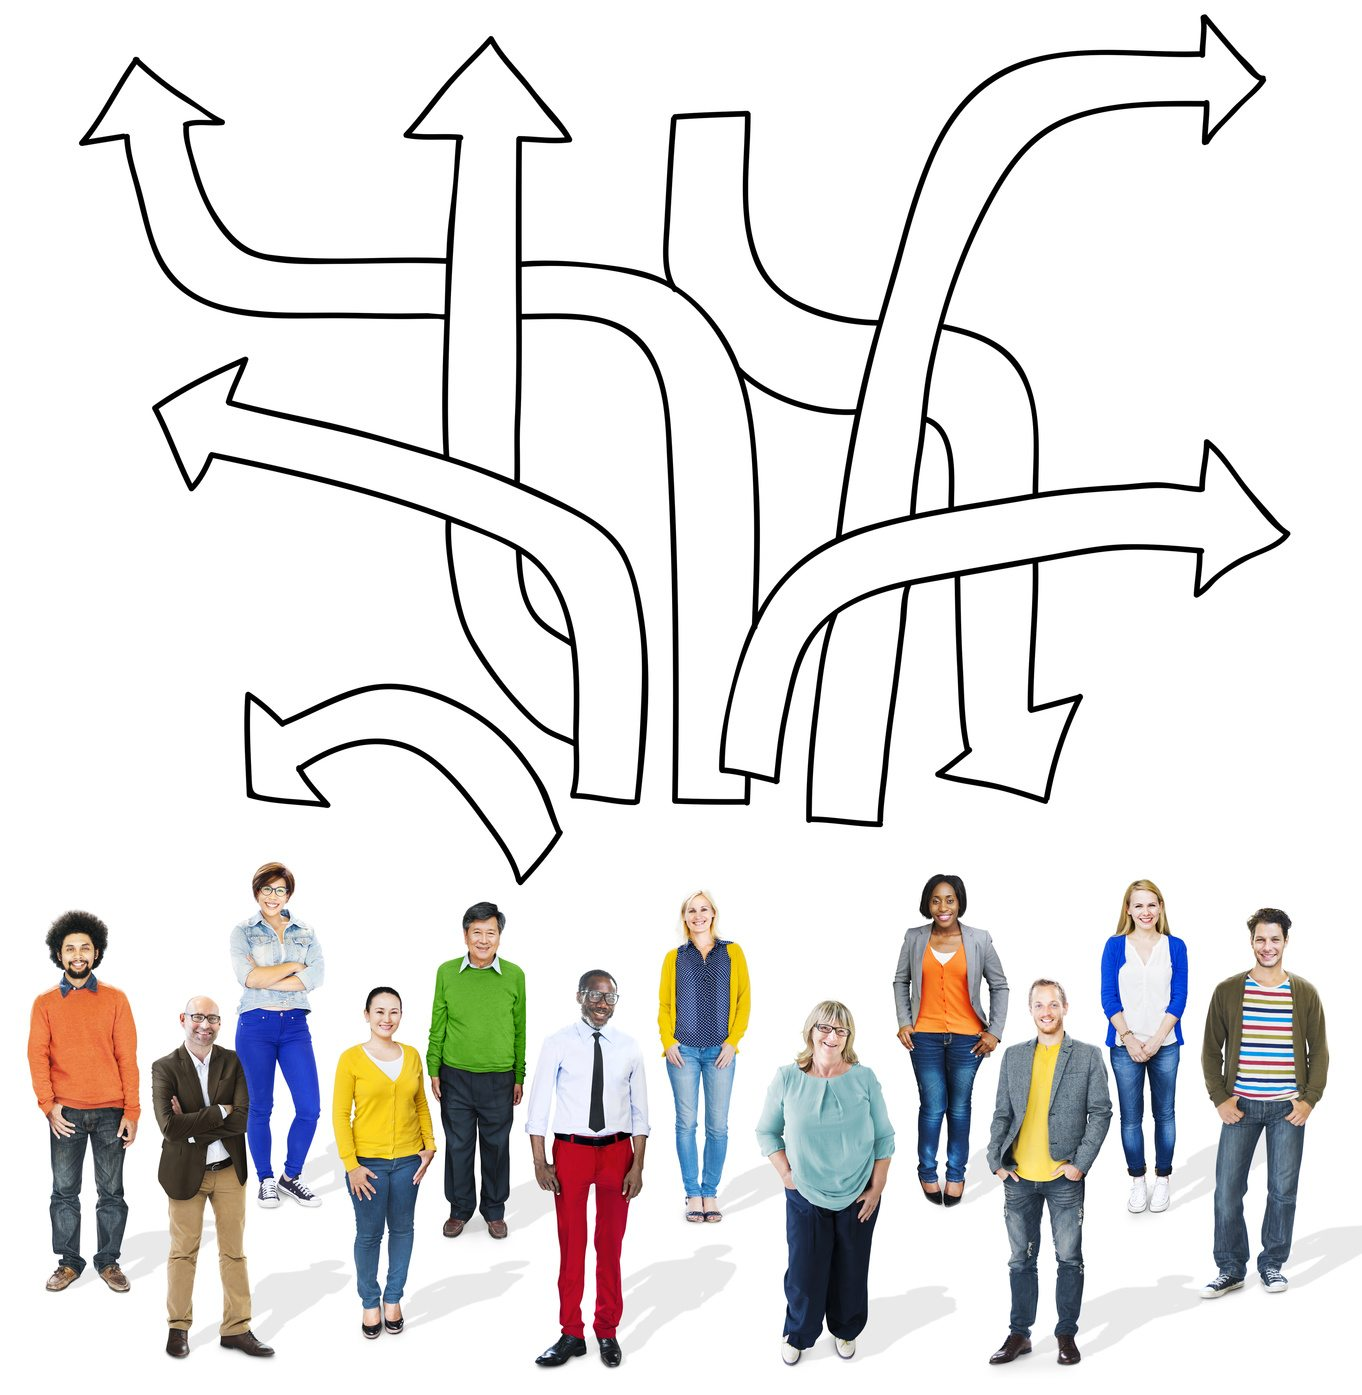 KAPSARC Toolkit for Behavioral Analysis (KTAB)